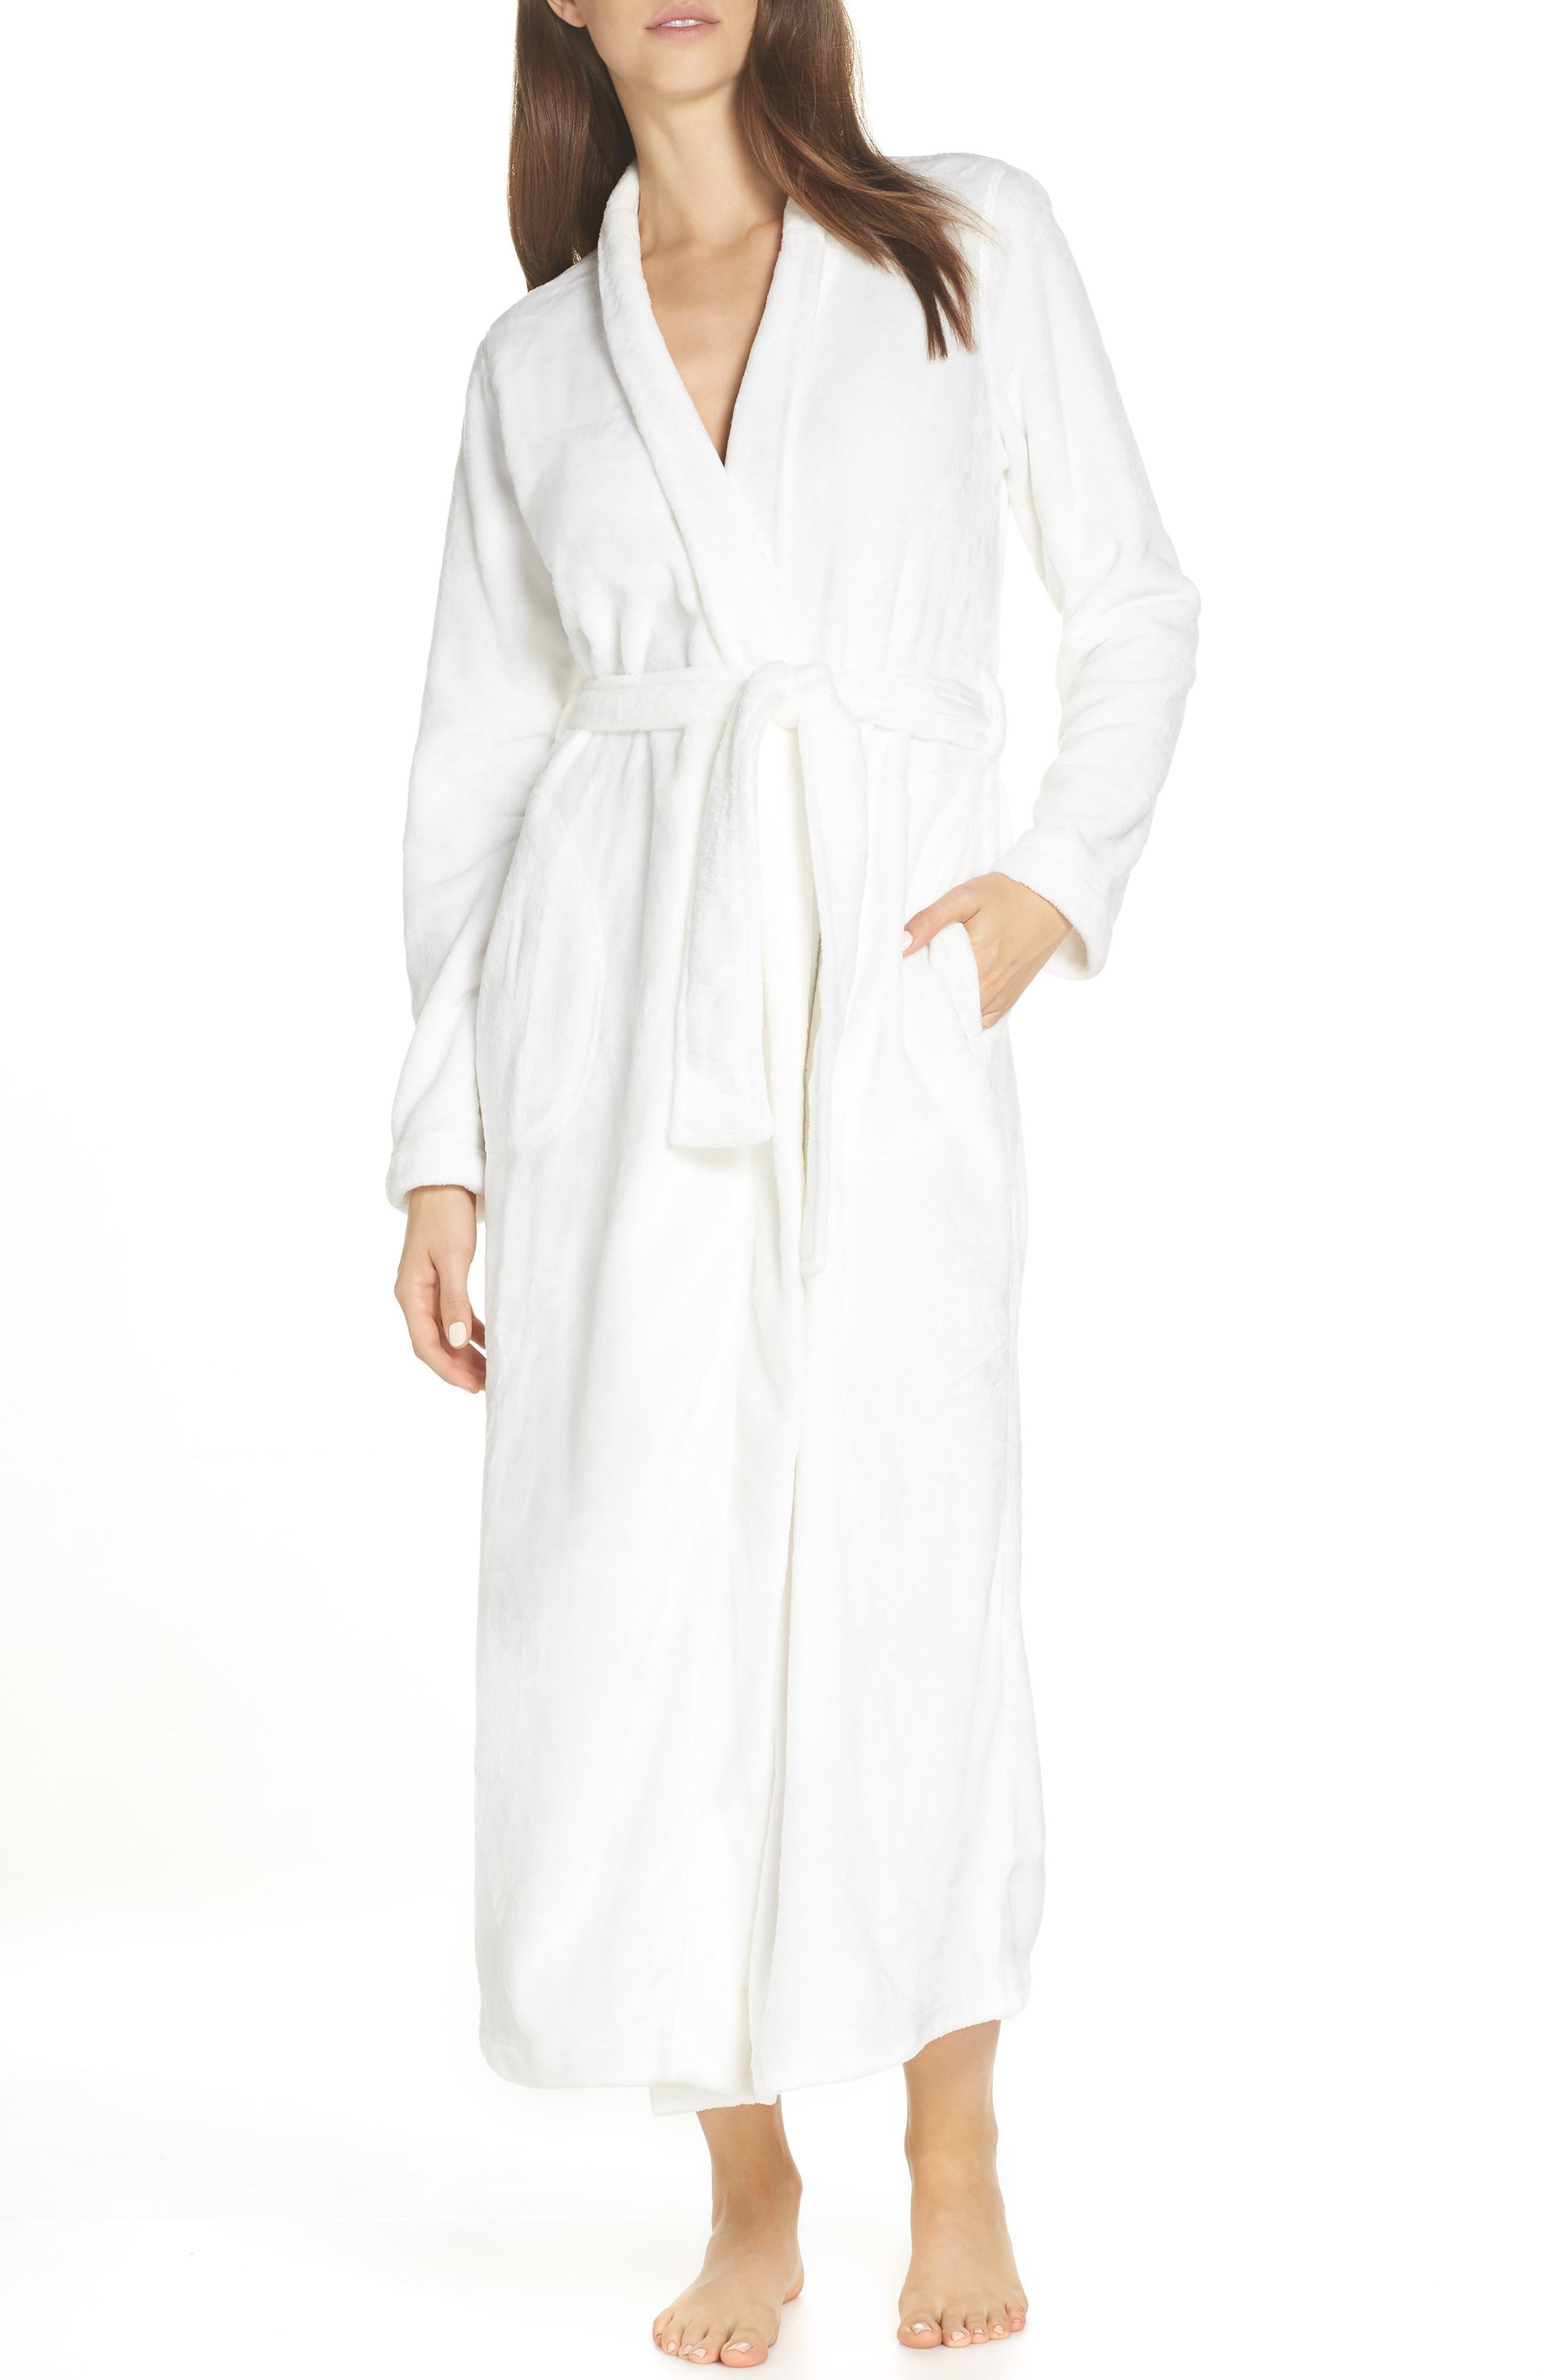 UGG<SUP>®</SUP>, Marlow Double-Face Fleece Robe, Main thumbnail 1, color, SEAGULL